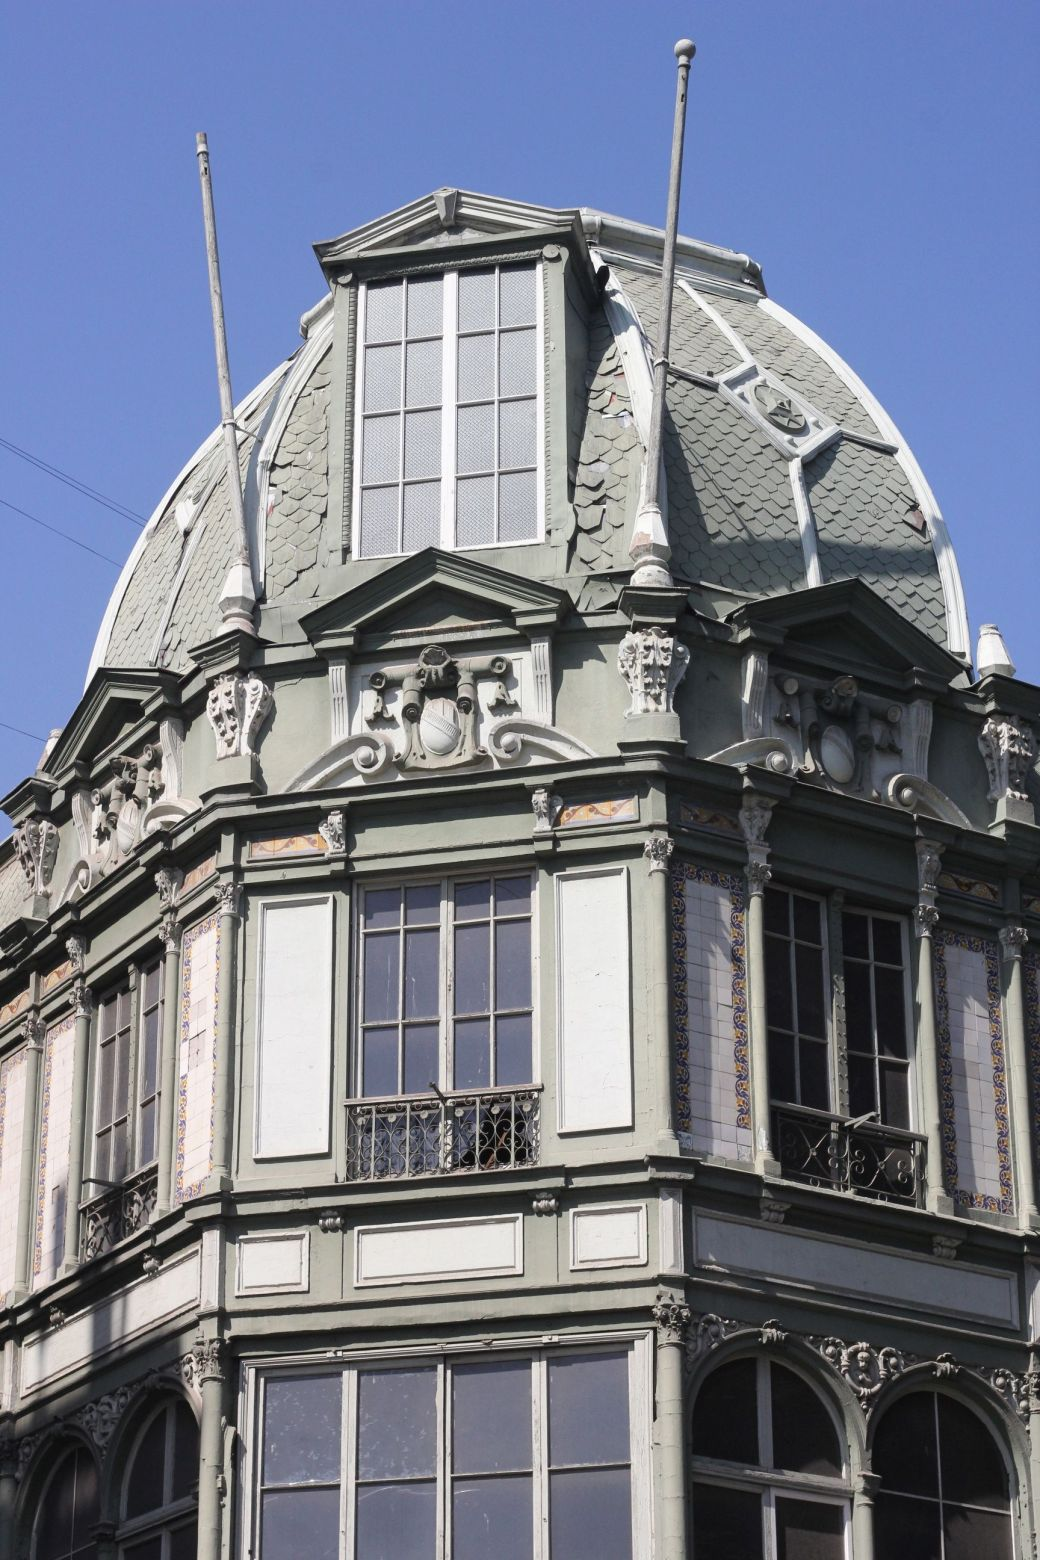 chile santiago plaza de armas building round roof